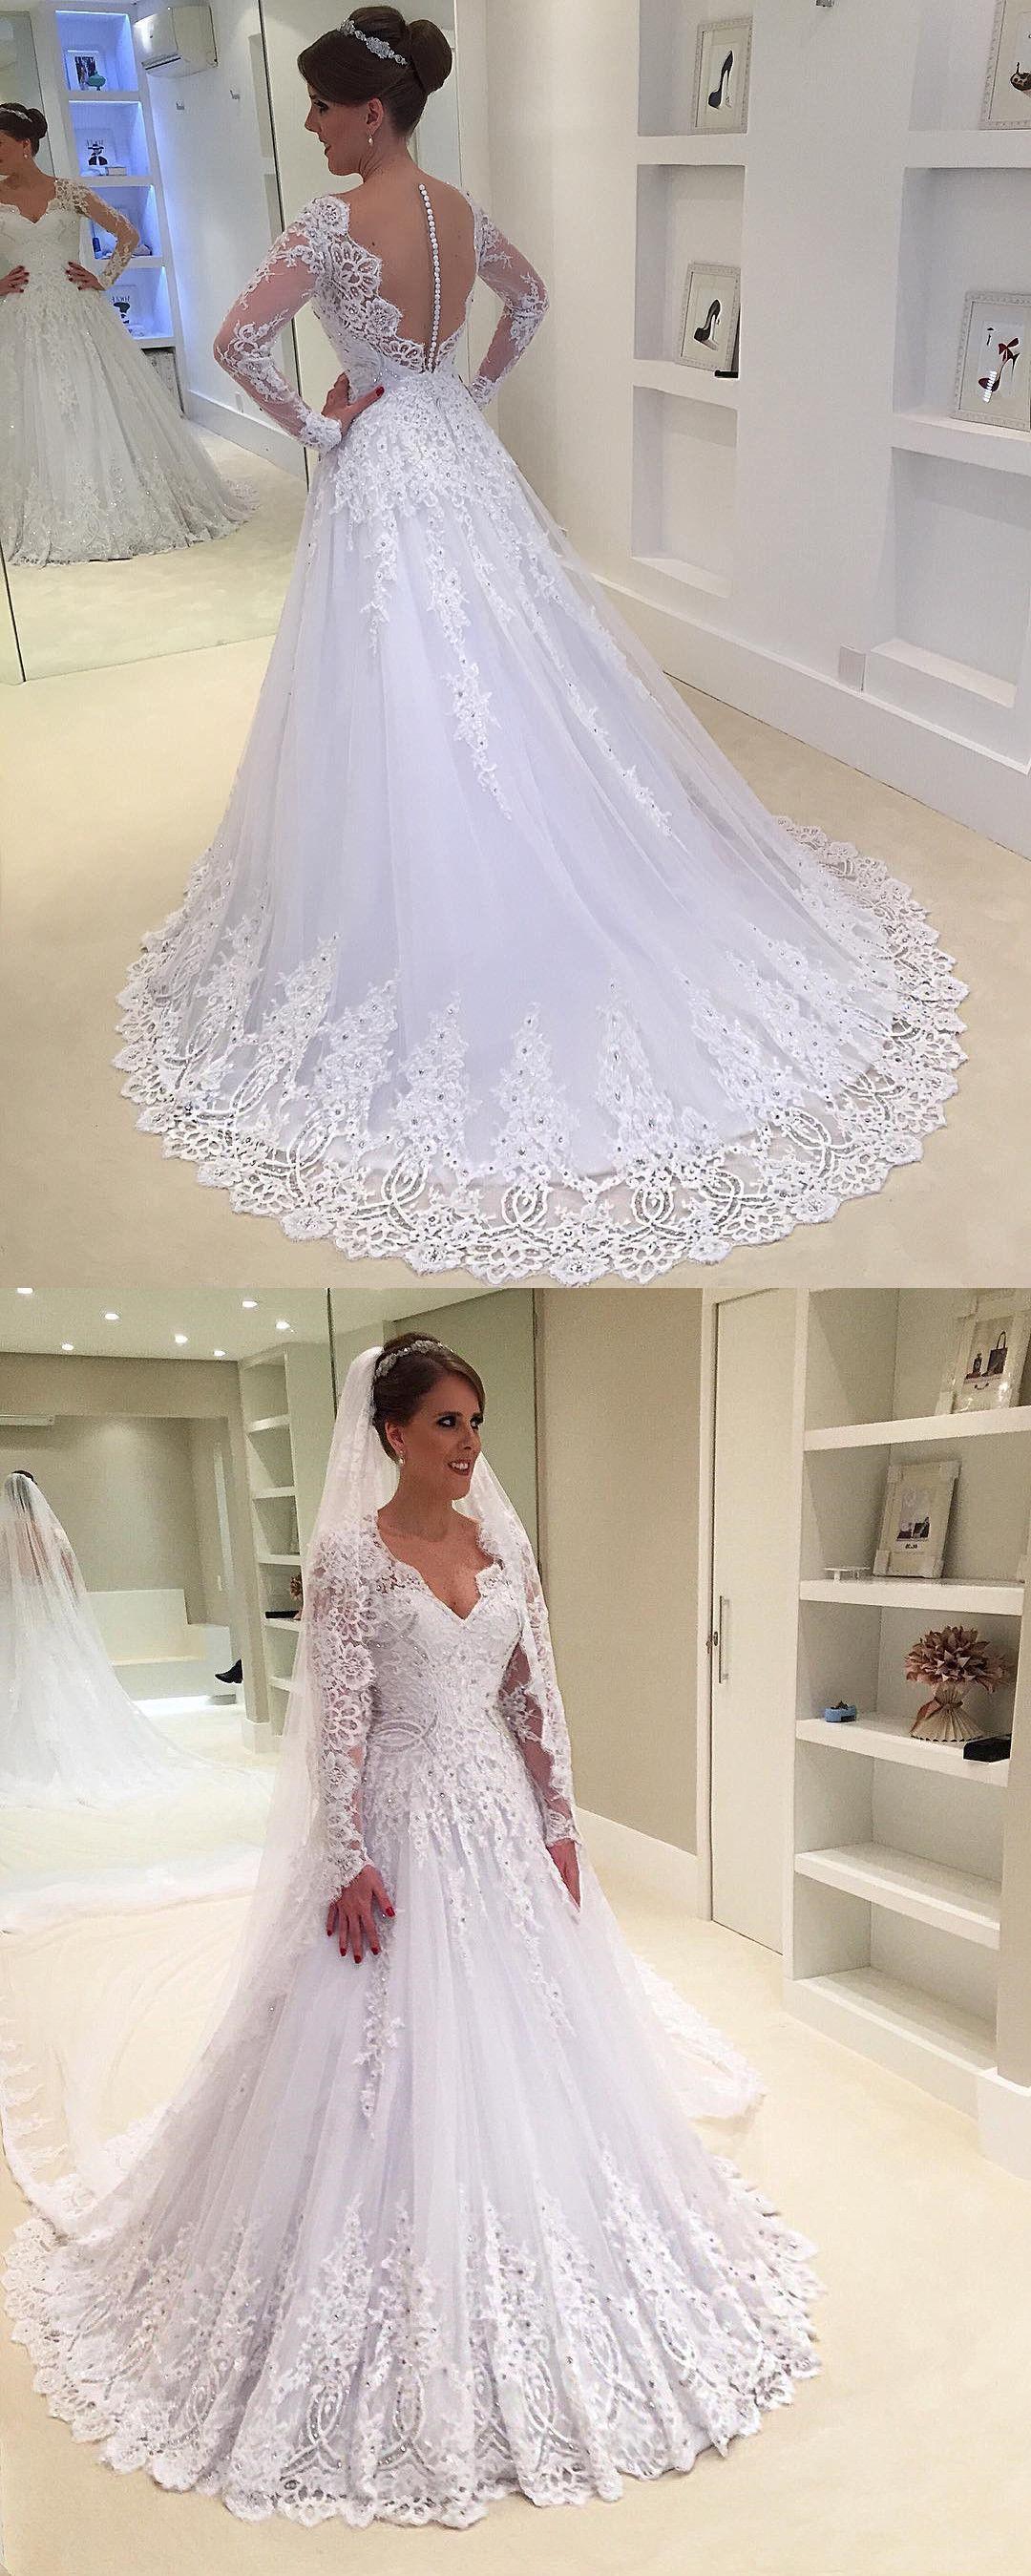 Long wedding dress  wedding dress bridal gown white long wedding dress long sleeves